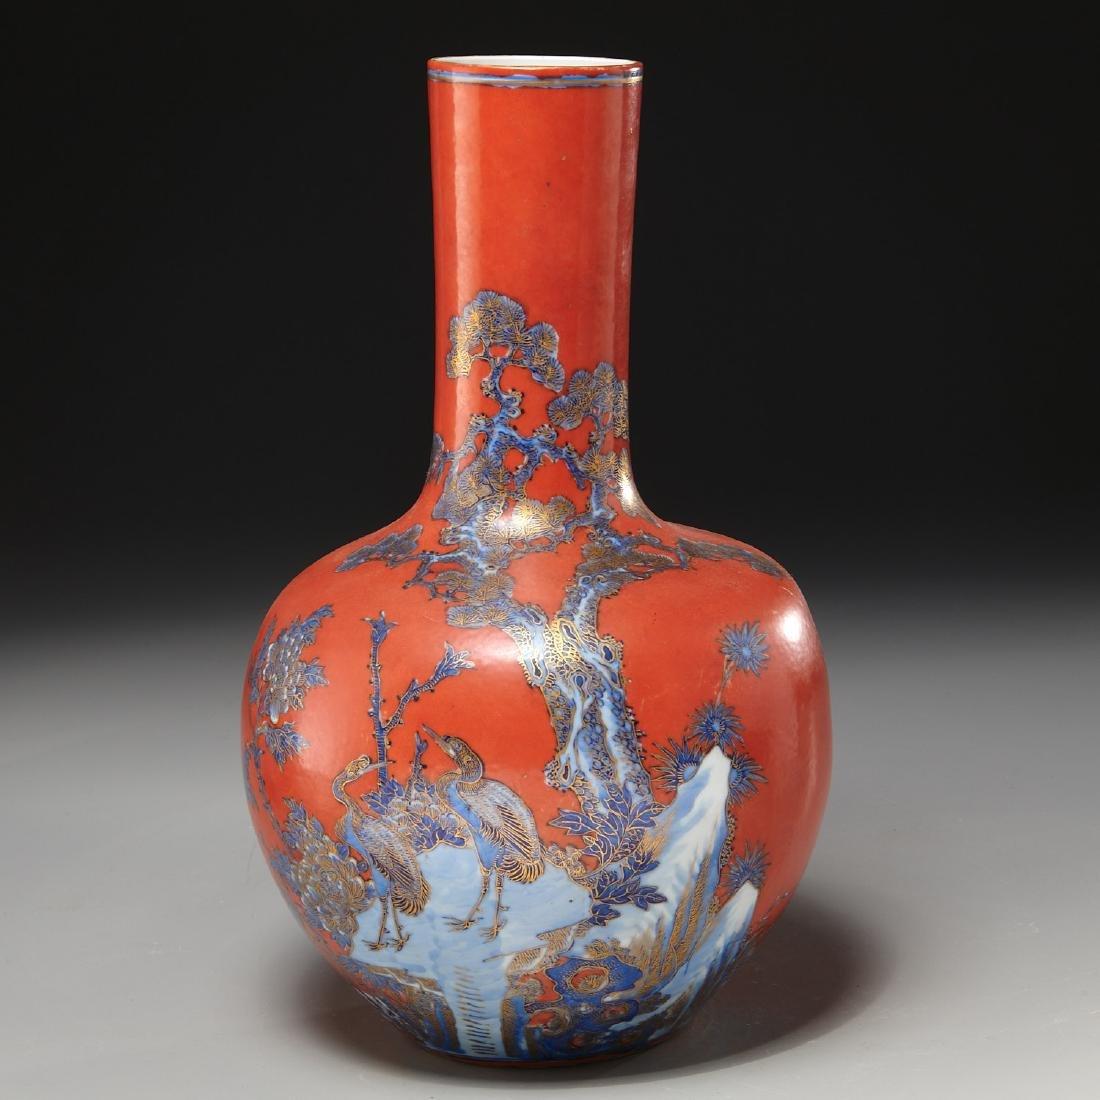 Chinese iron red ground porcelain vase